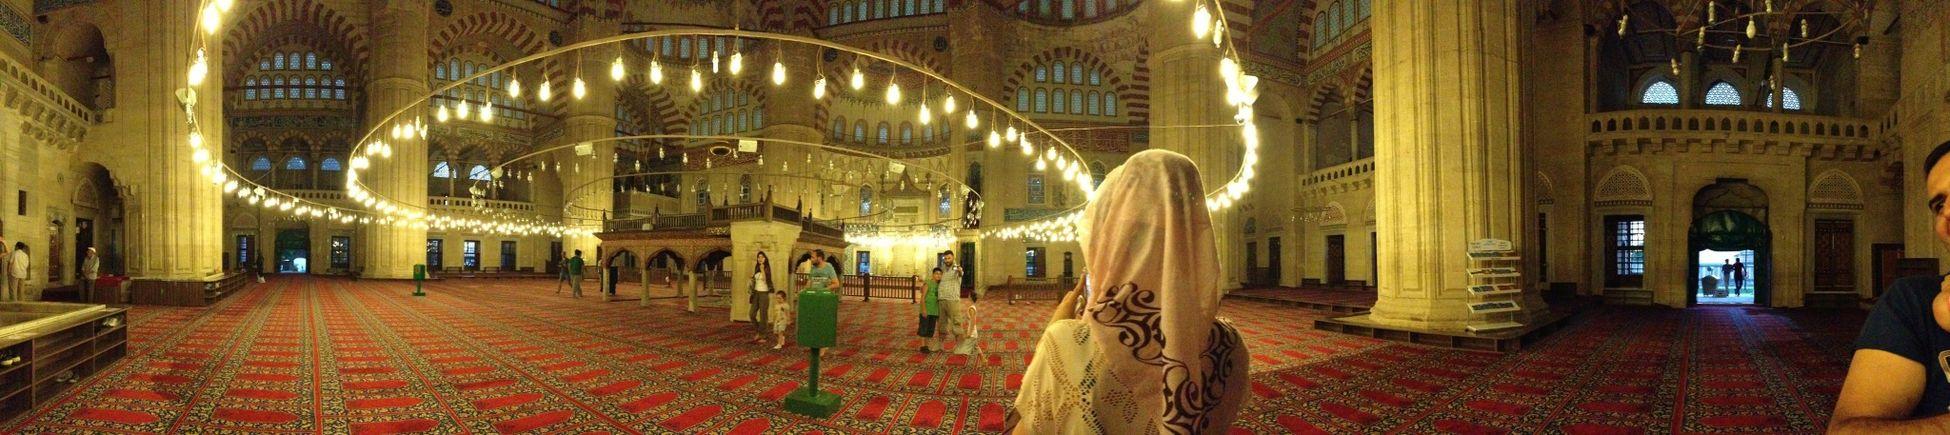 Mosque Panorama